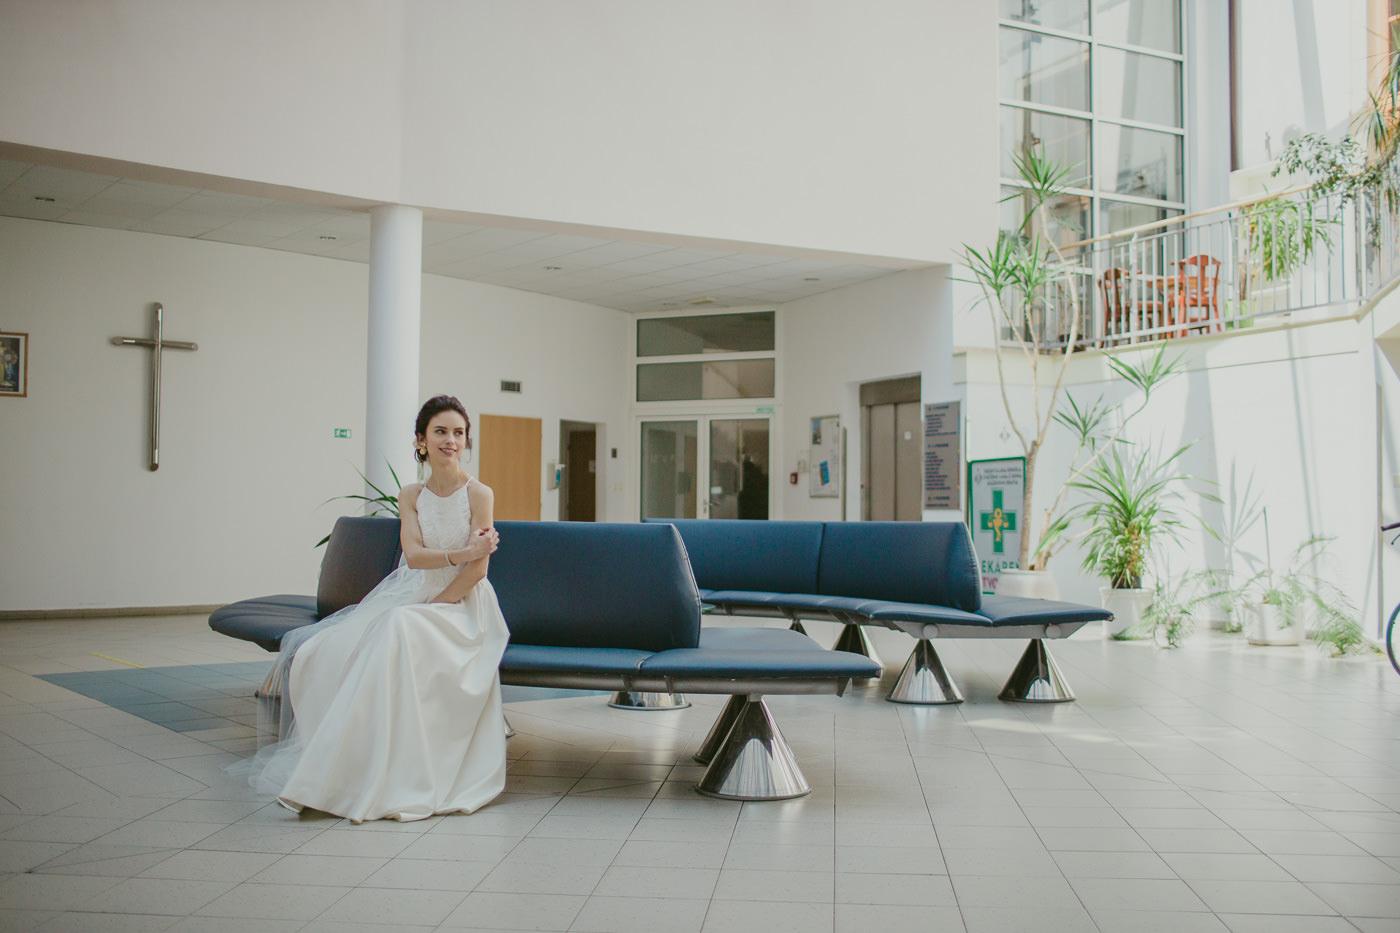 Svadba Bratislava wedding photography 00029